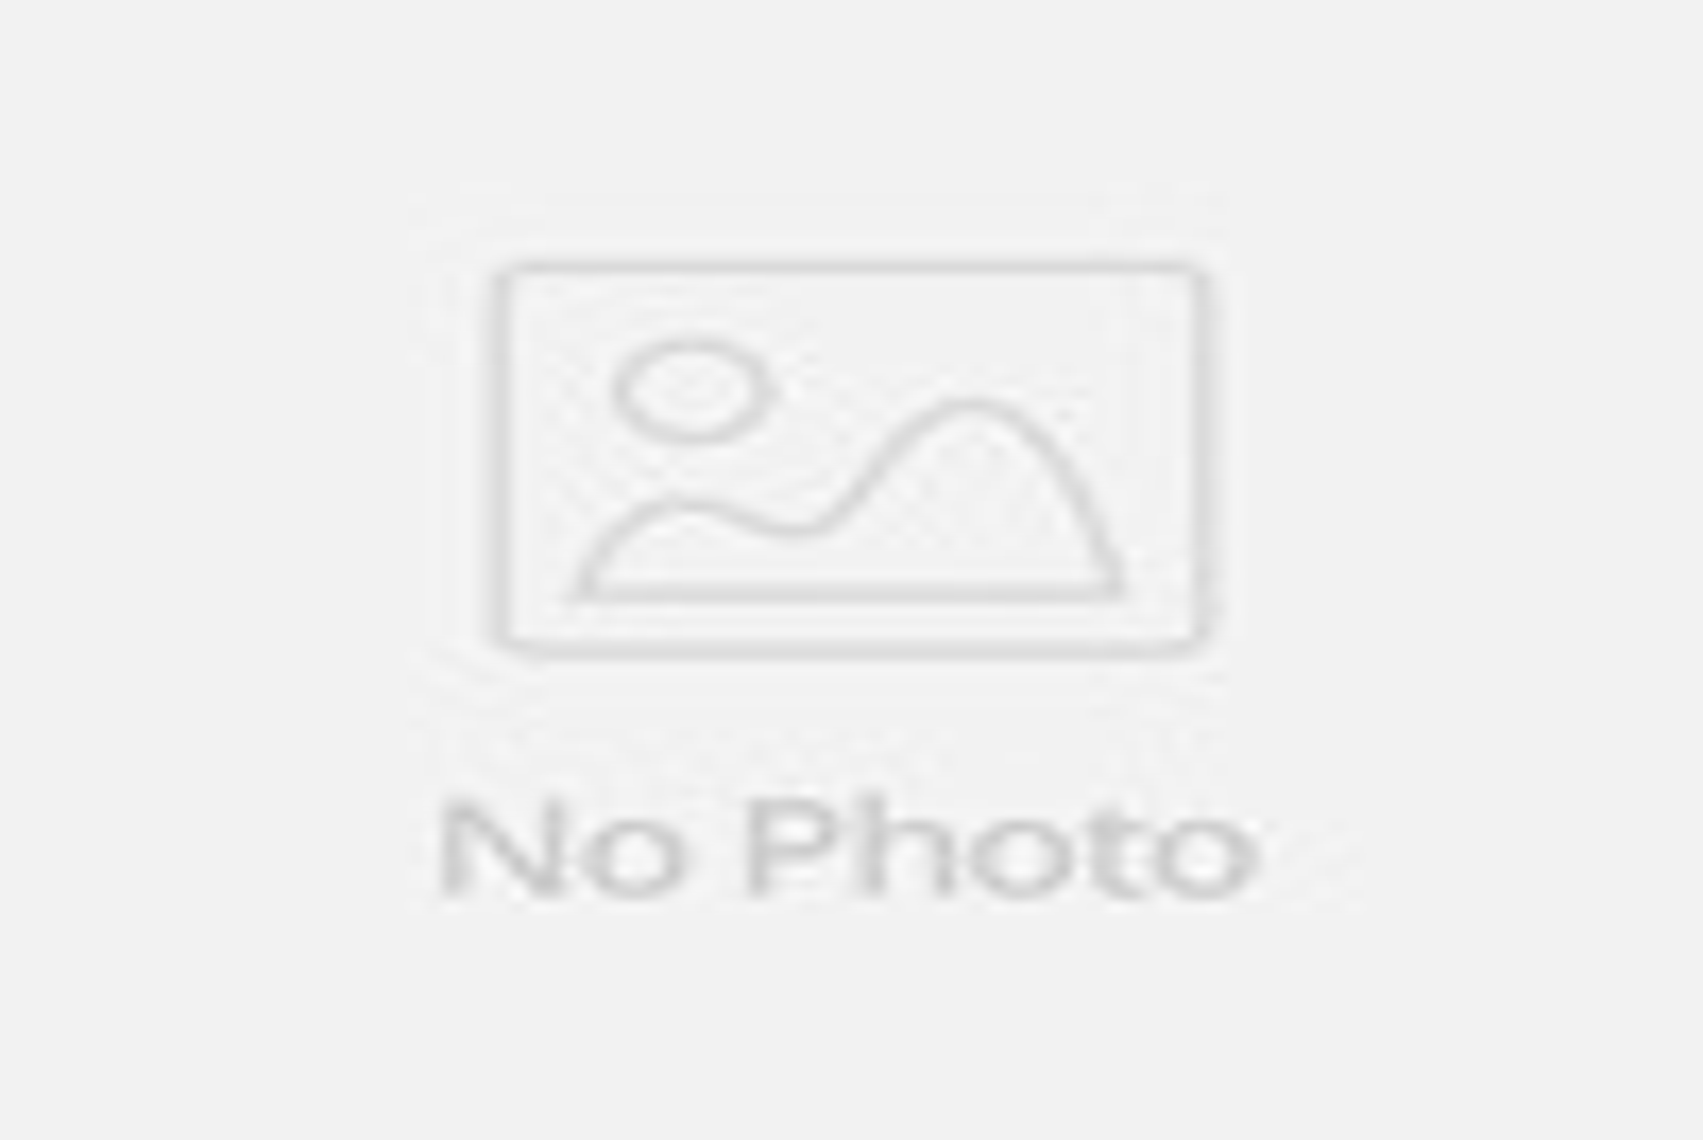 Four Common Saxophones Common Grade Alto Saxophone